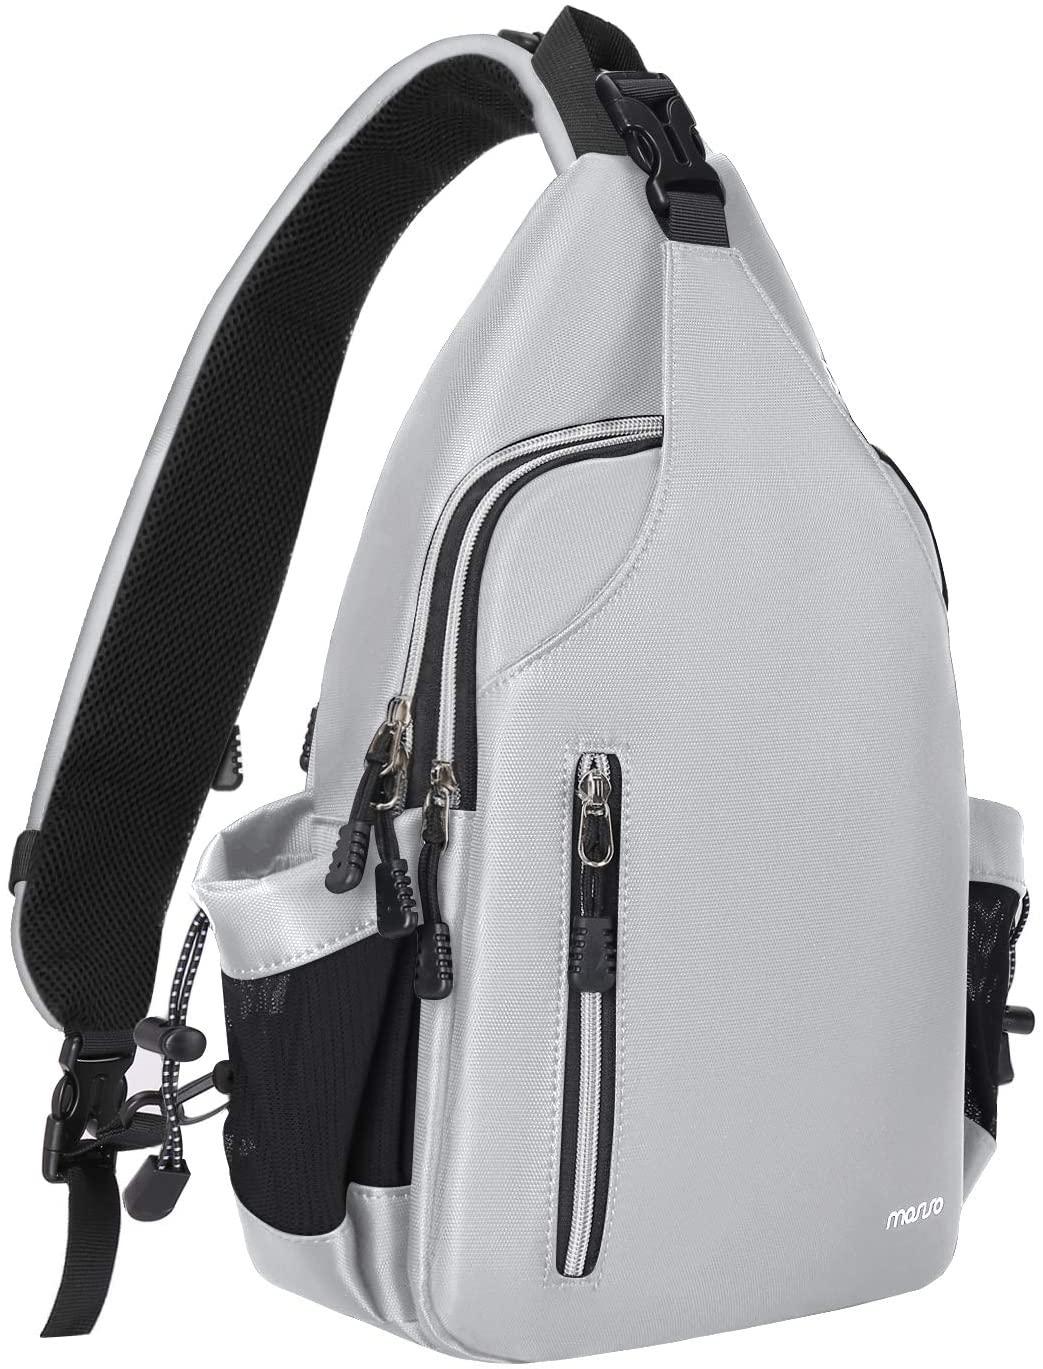 MOSISO Sling Backpack Double Layer Hiking Daypack Men/Women Chest Shoulder Bag